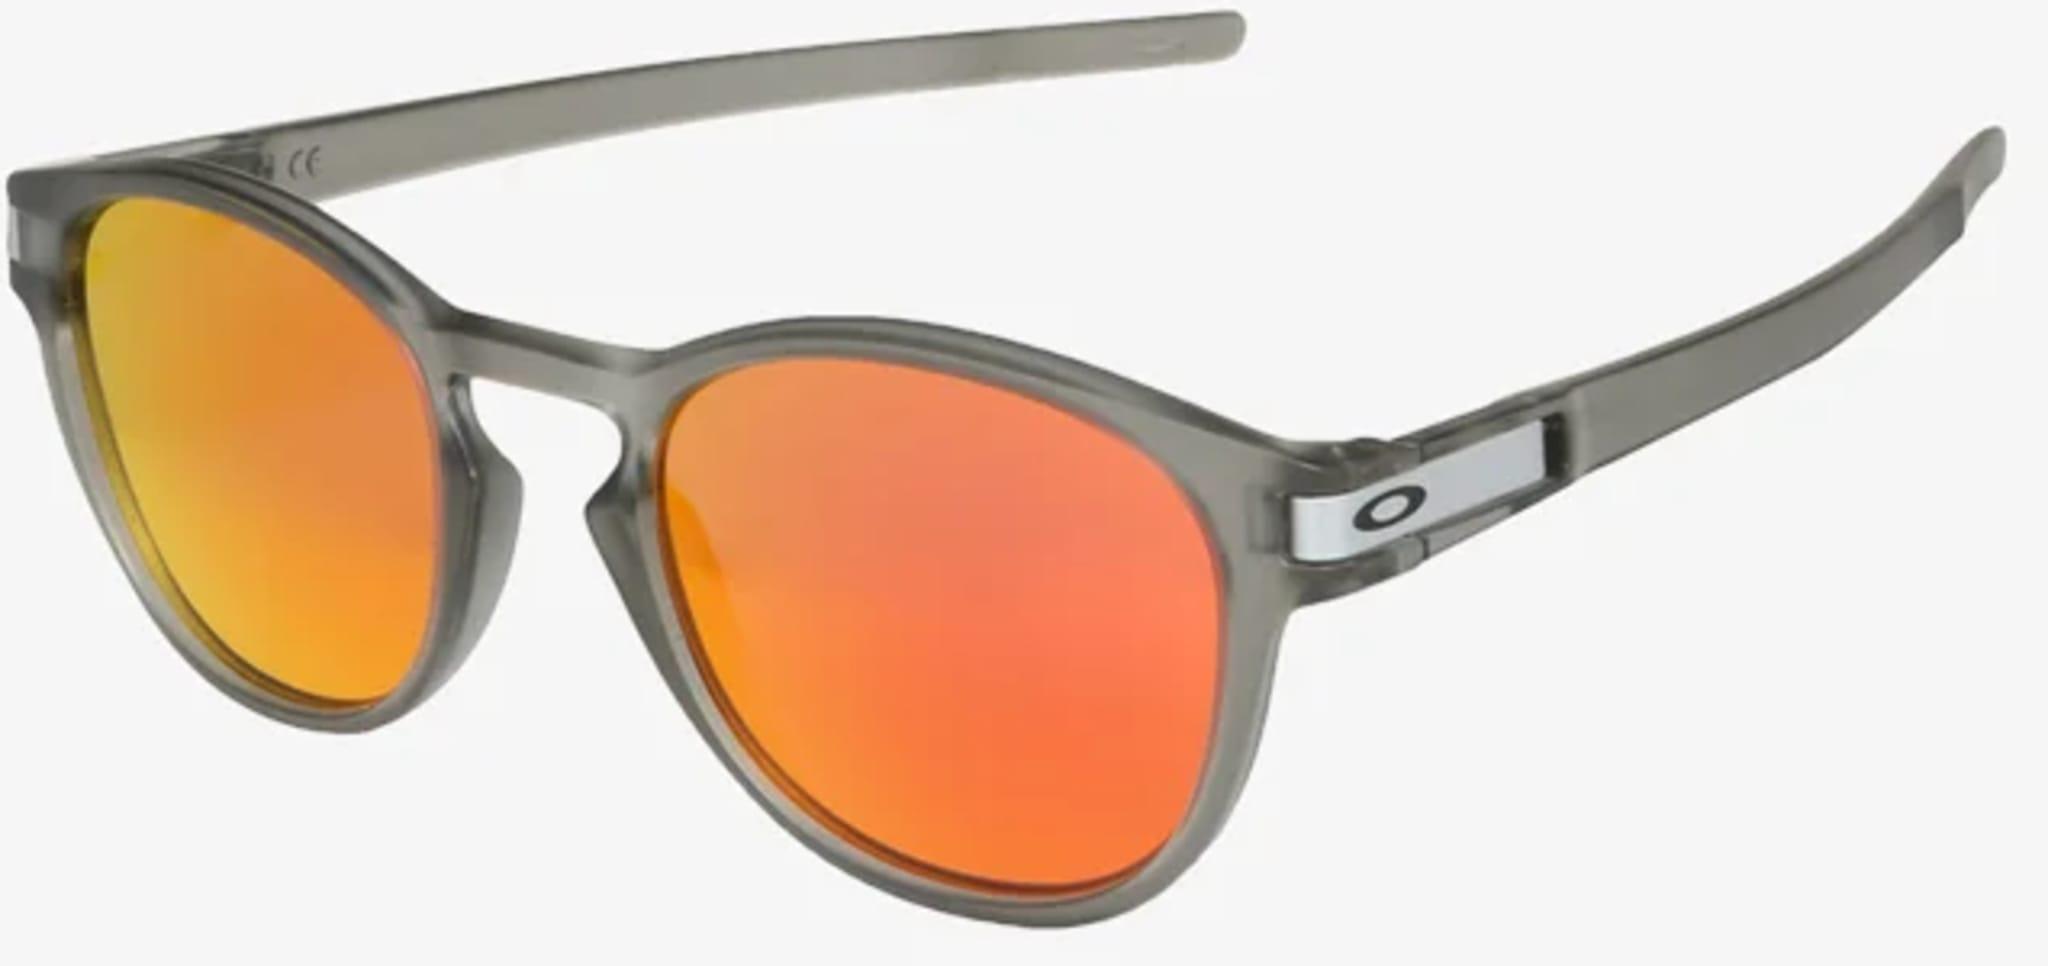 Tøff solbrille med originalt utseende